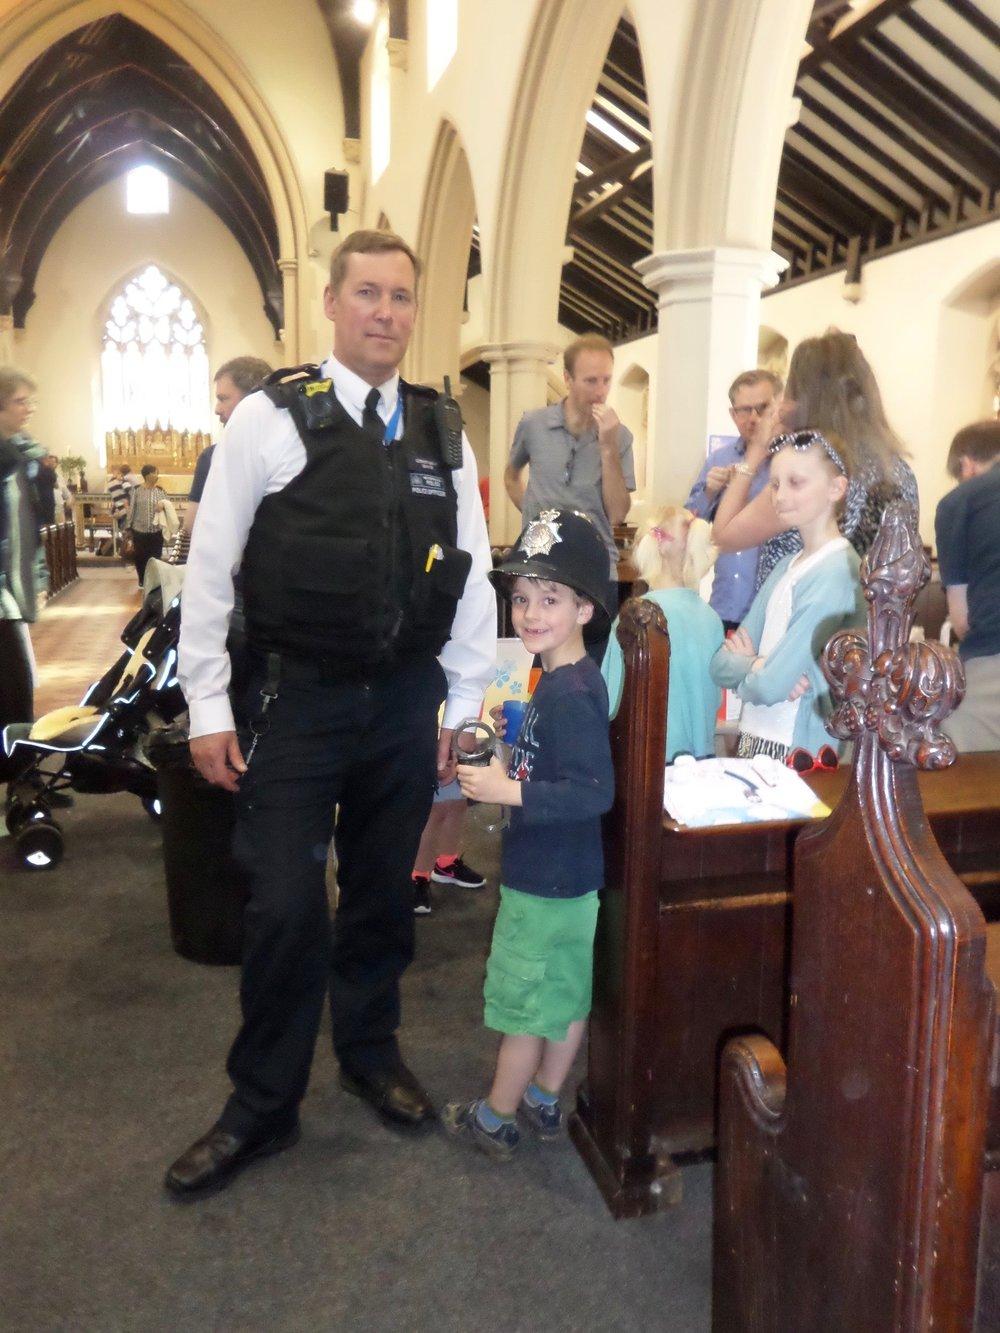 Harry and policeman.jpg